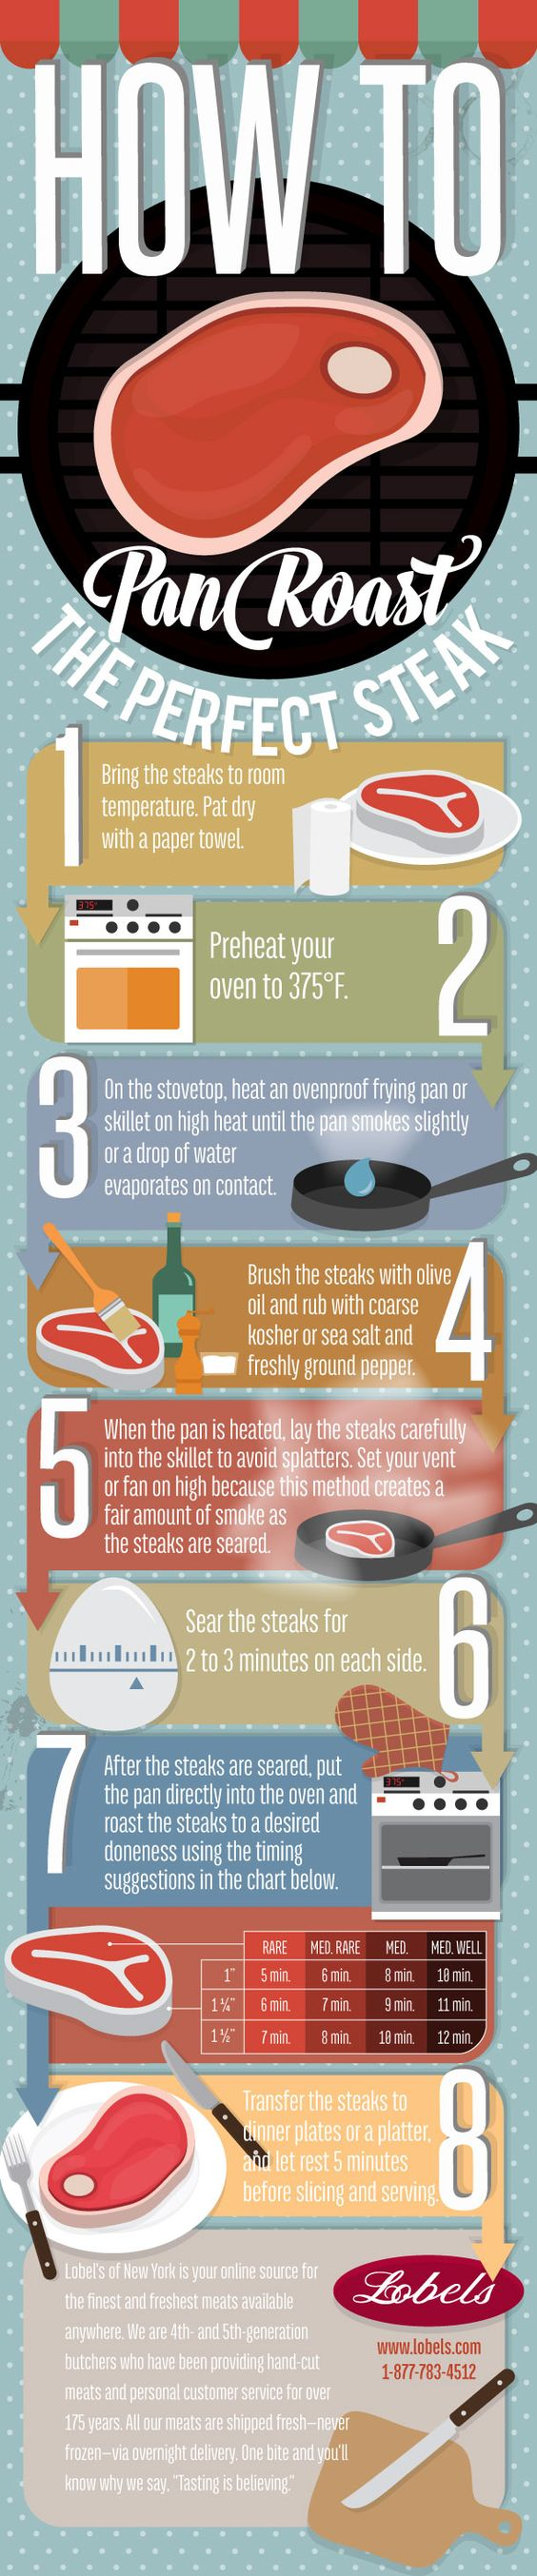 how to make tasty sliders